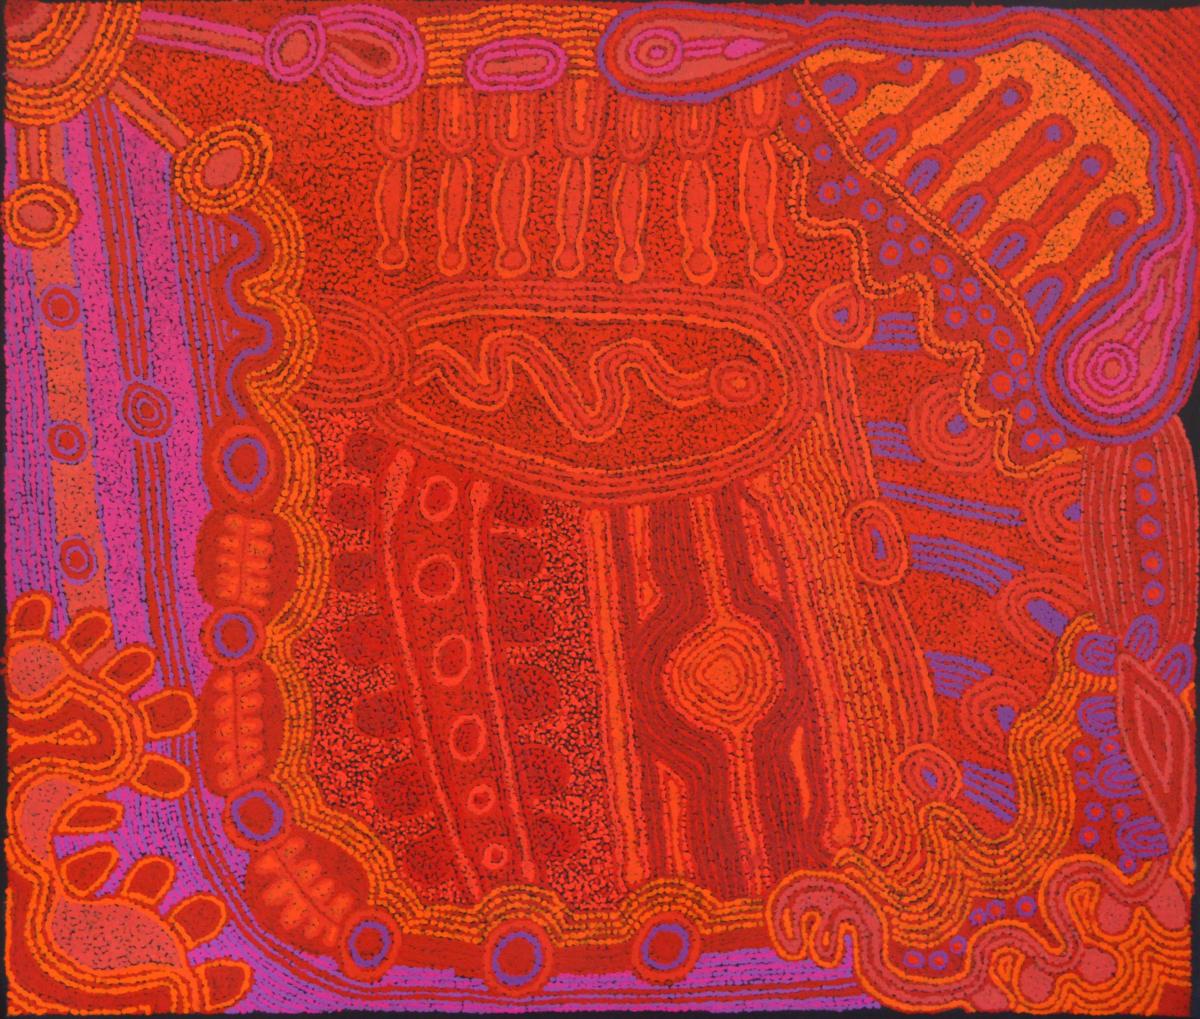 Unurupa Kulyuru Ngayuku ngura - My Country acrylic on canvas 84 x 100 cm